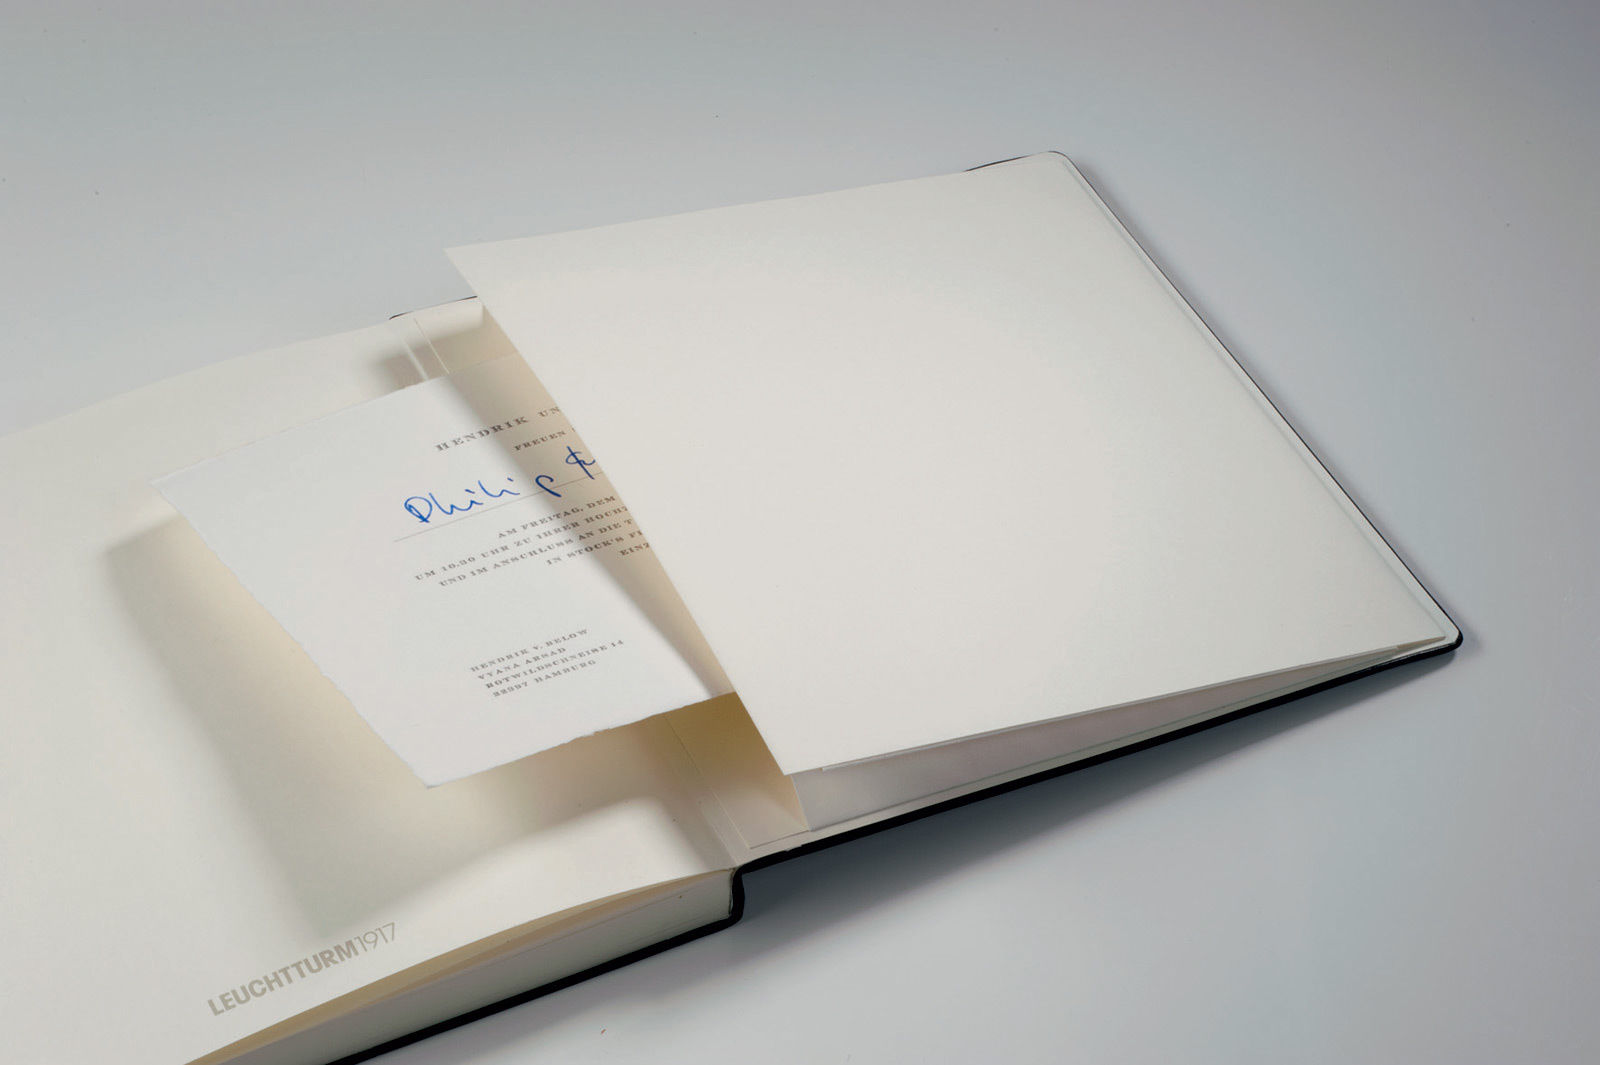 Leuchtturm1917-A6-Small-Pocket-Hardback-Notebook